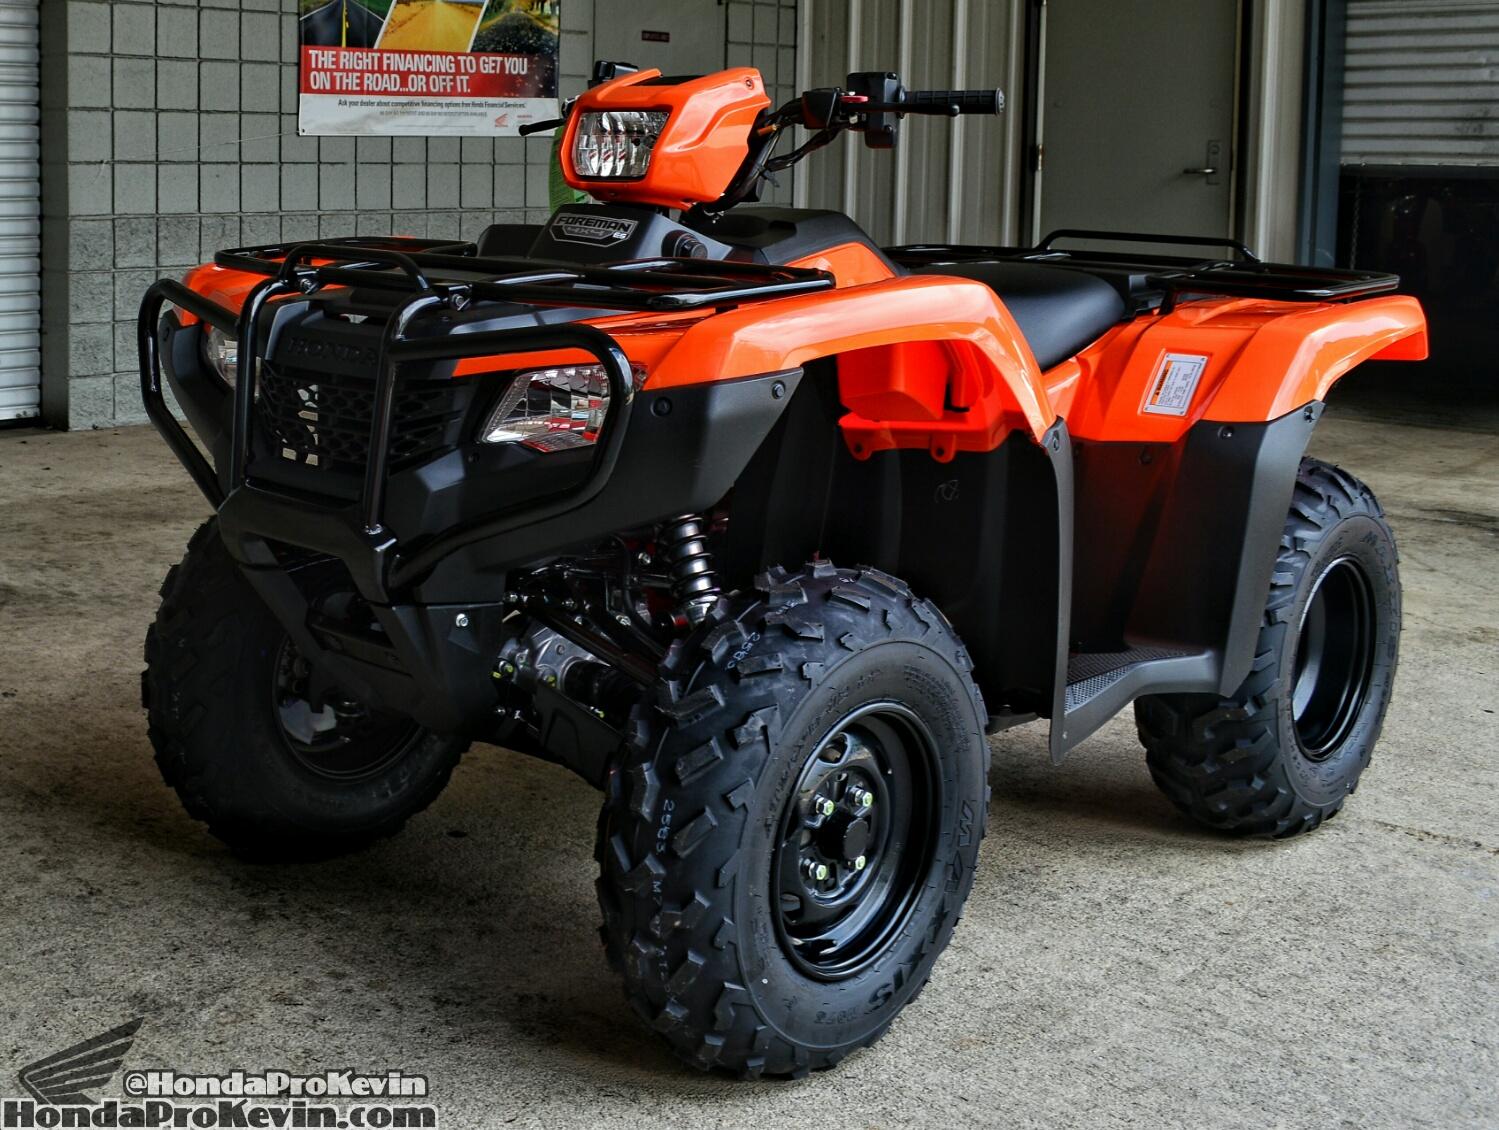 hight resolution of 2018 honda foreman 500 atv review specs horsepower price four wheeler